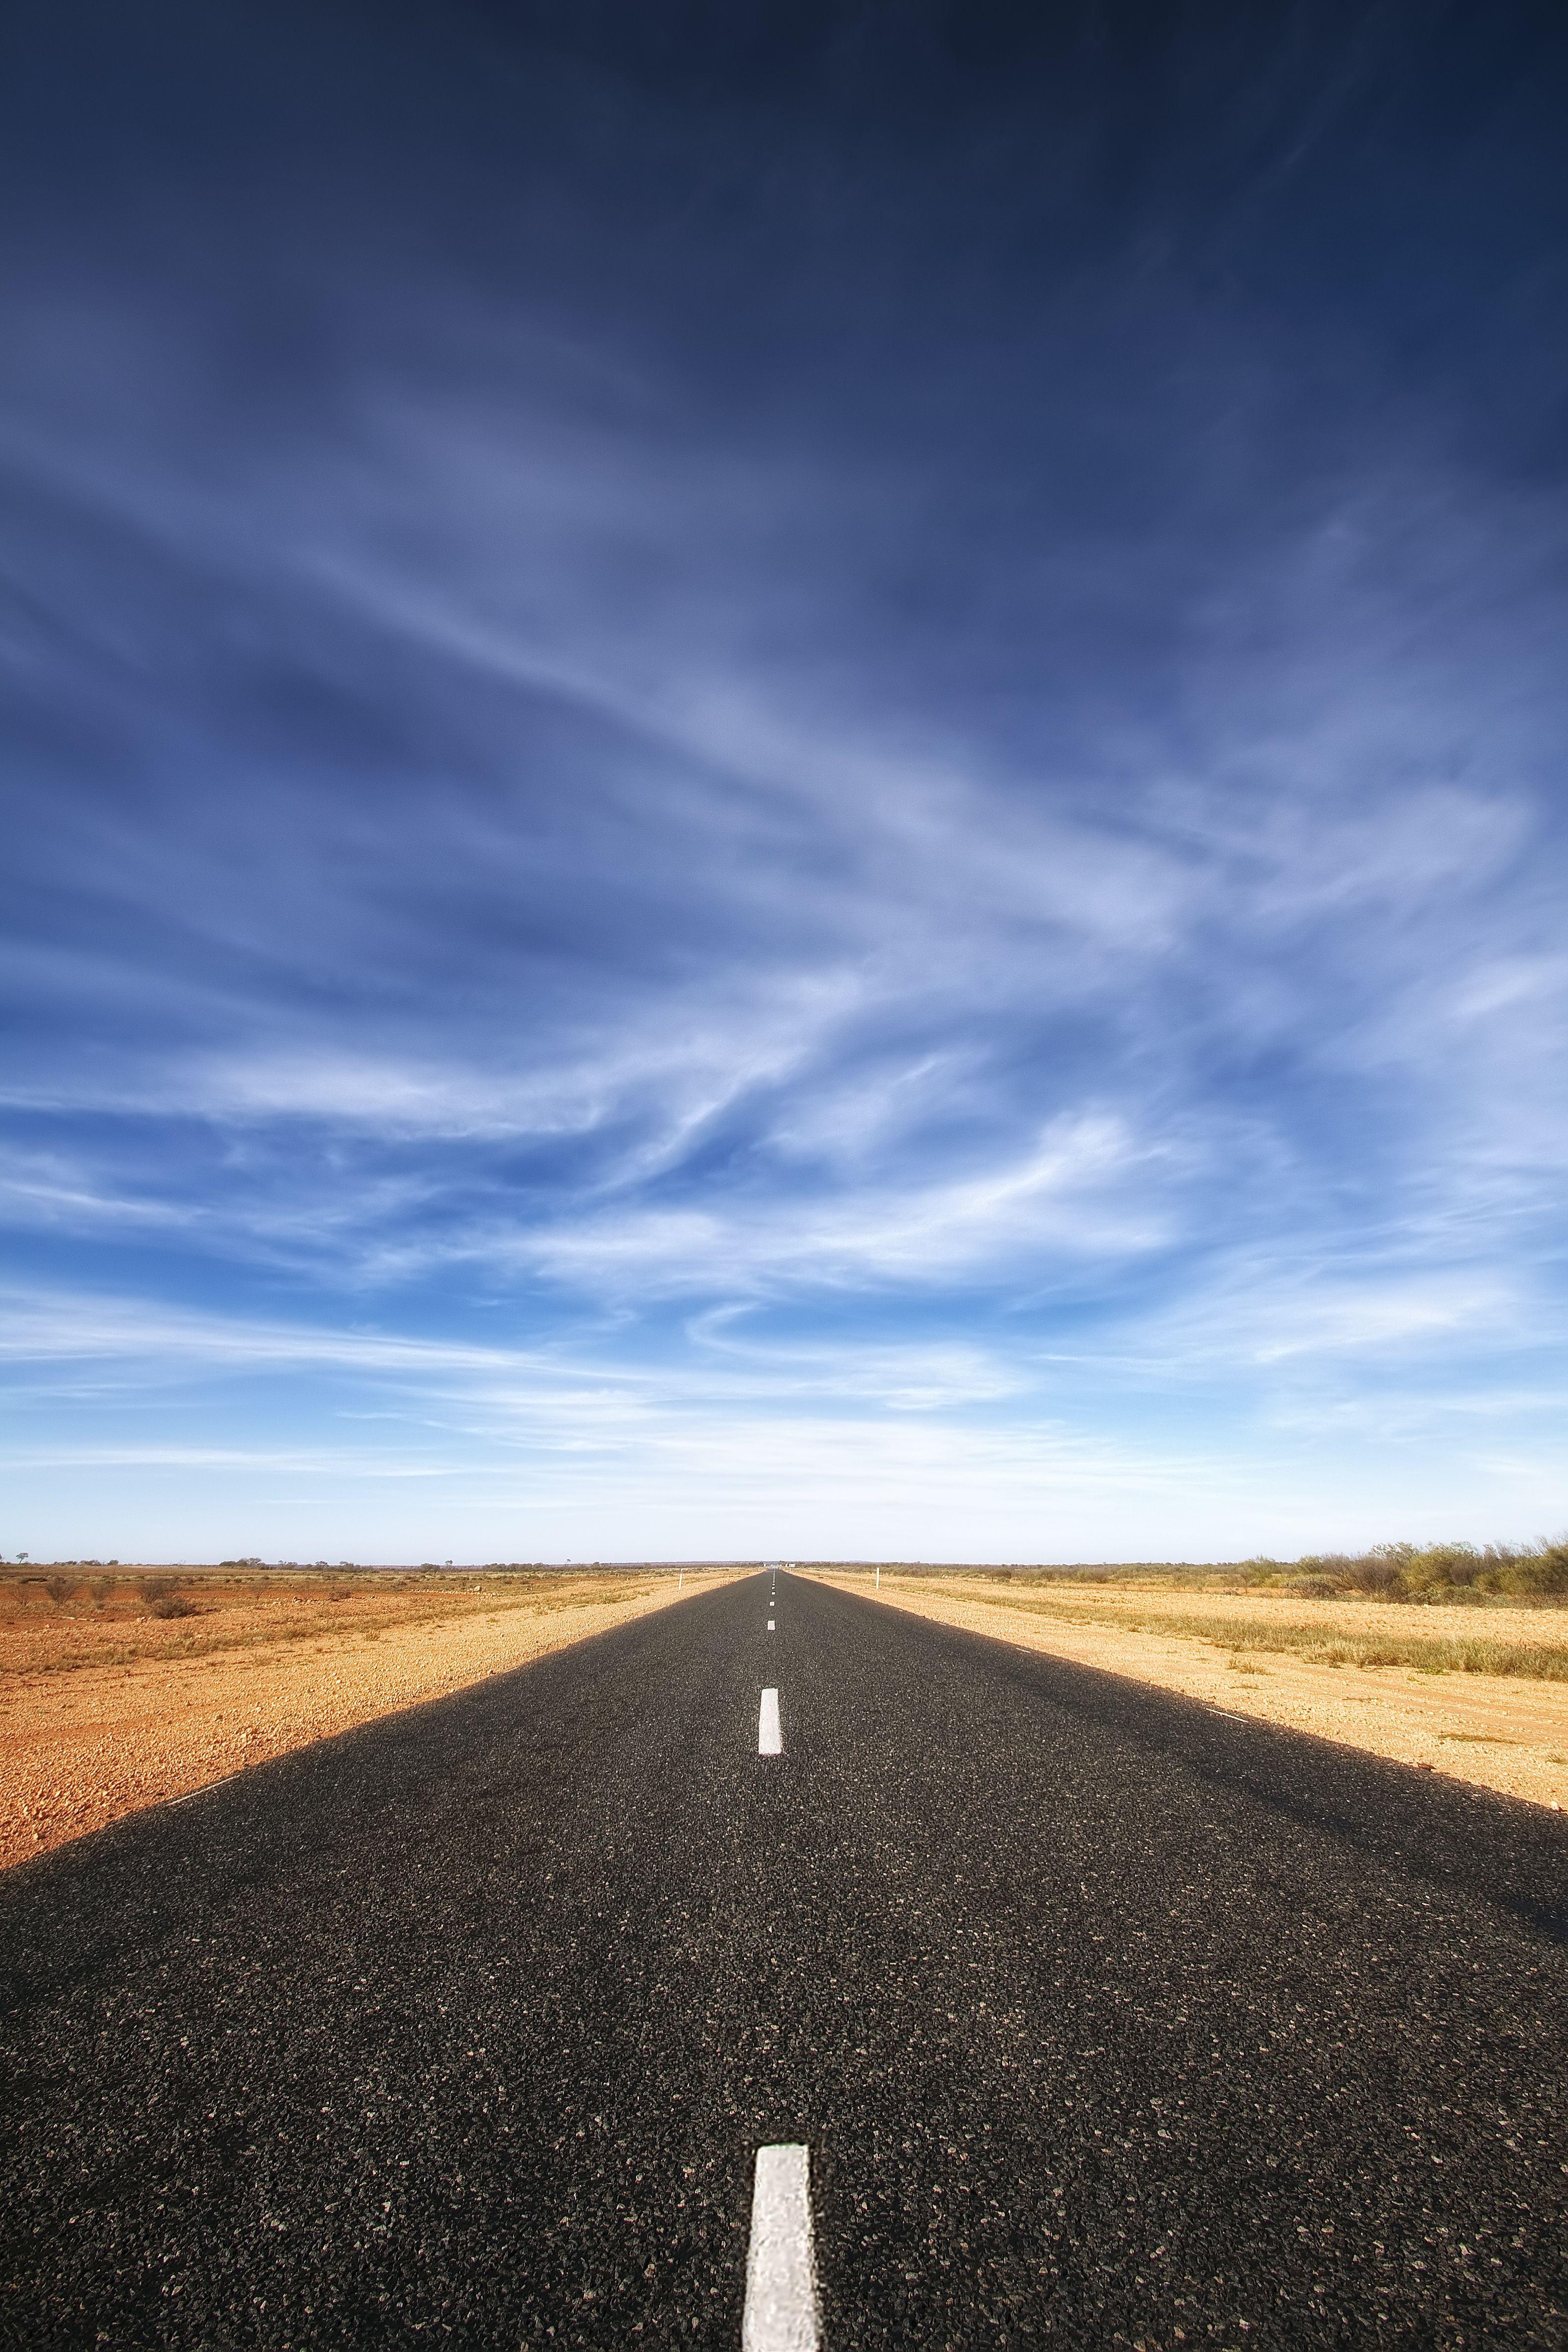 u0026 39 road to nowhere u0026 39   australia  alice springs to uluru  outback